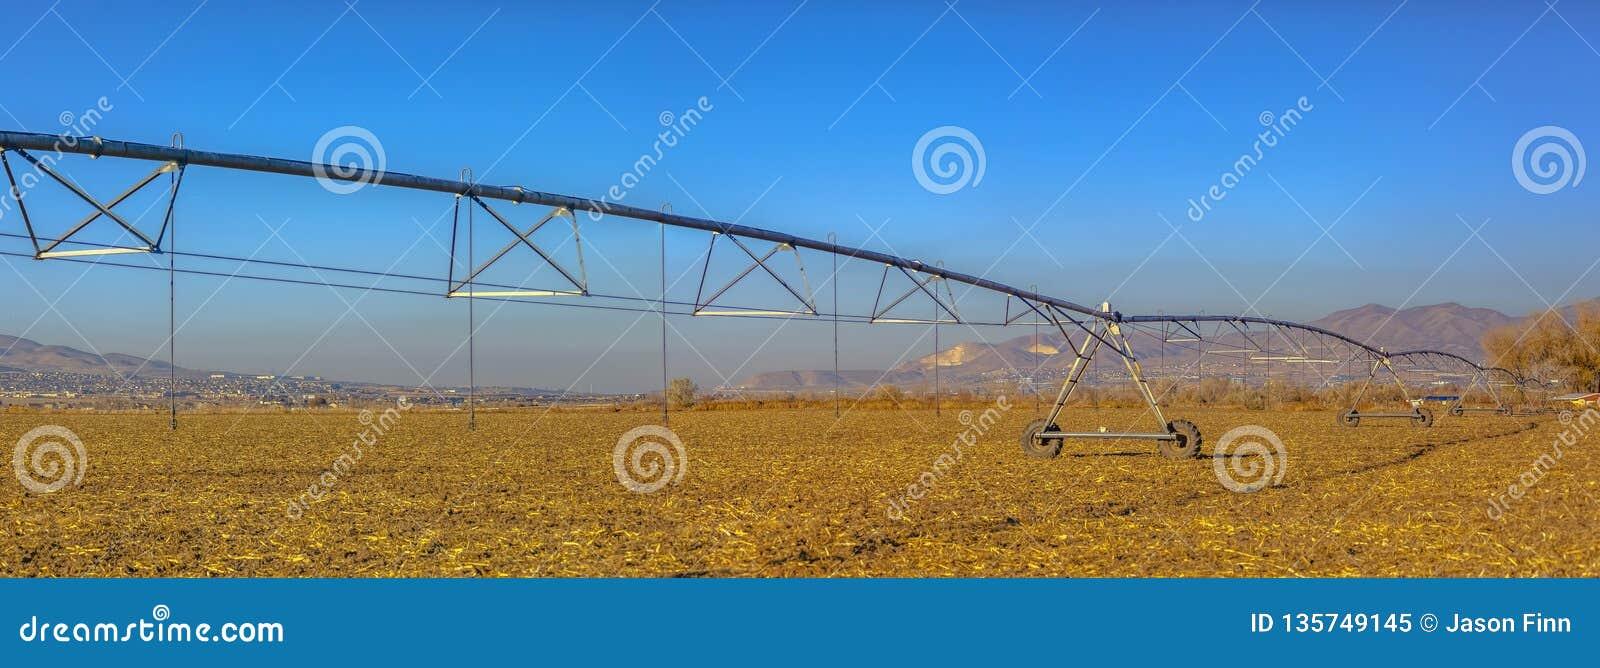 Centrum pivot systemu irygacyjnego panorama w polu